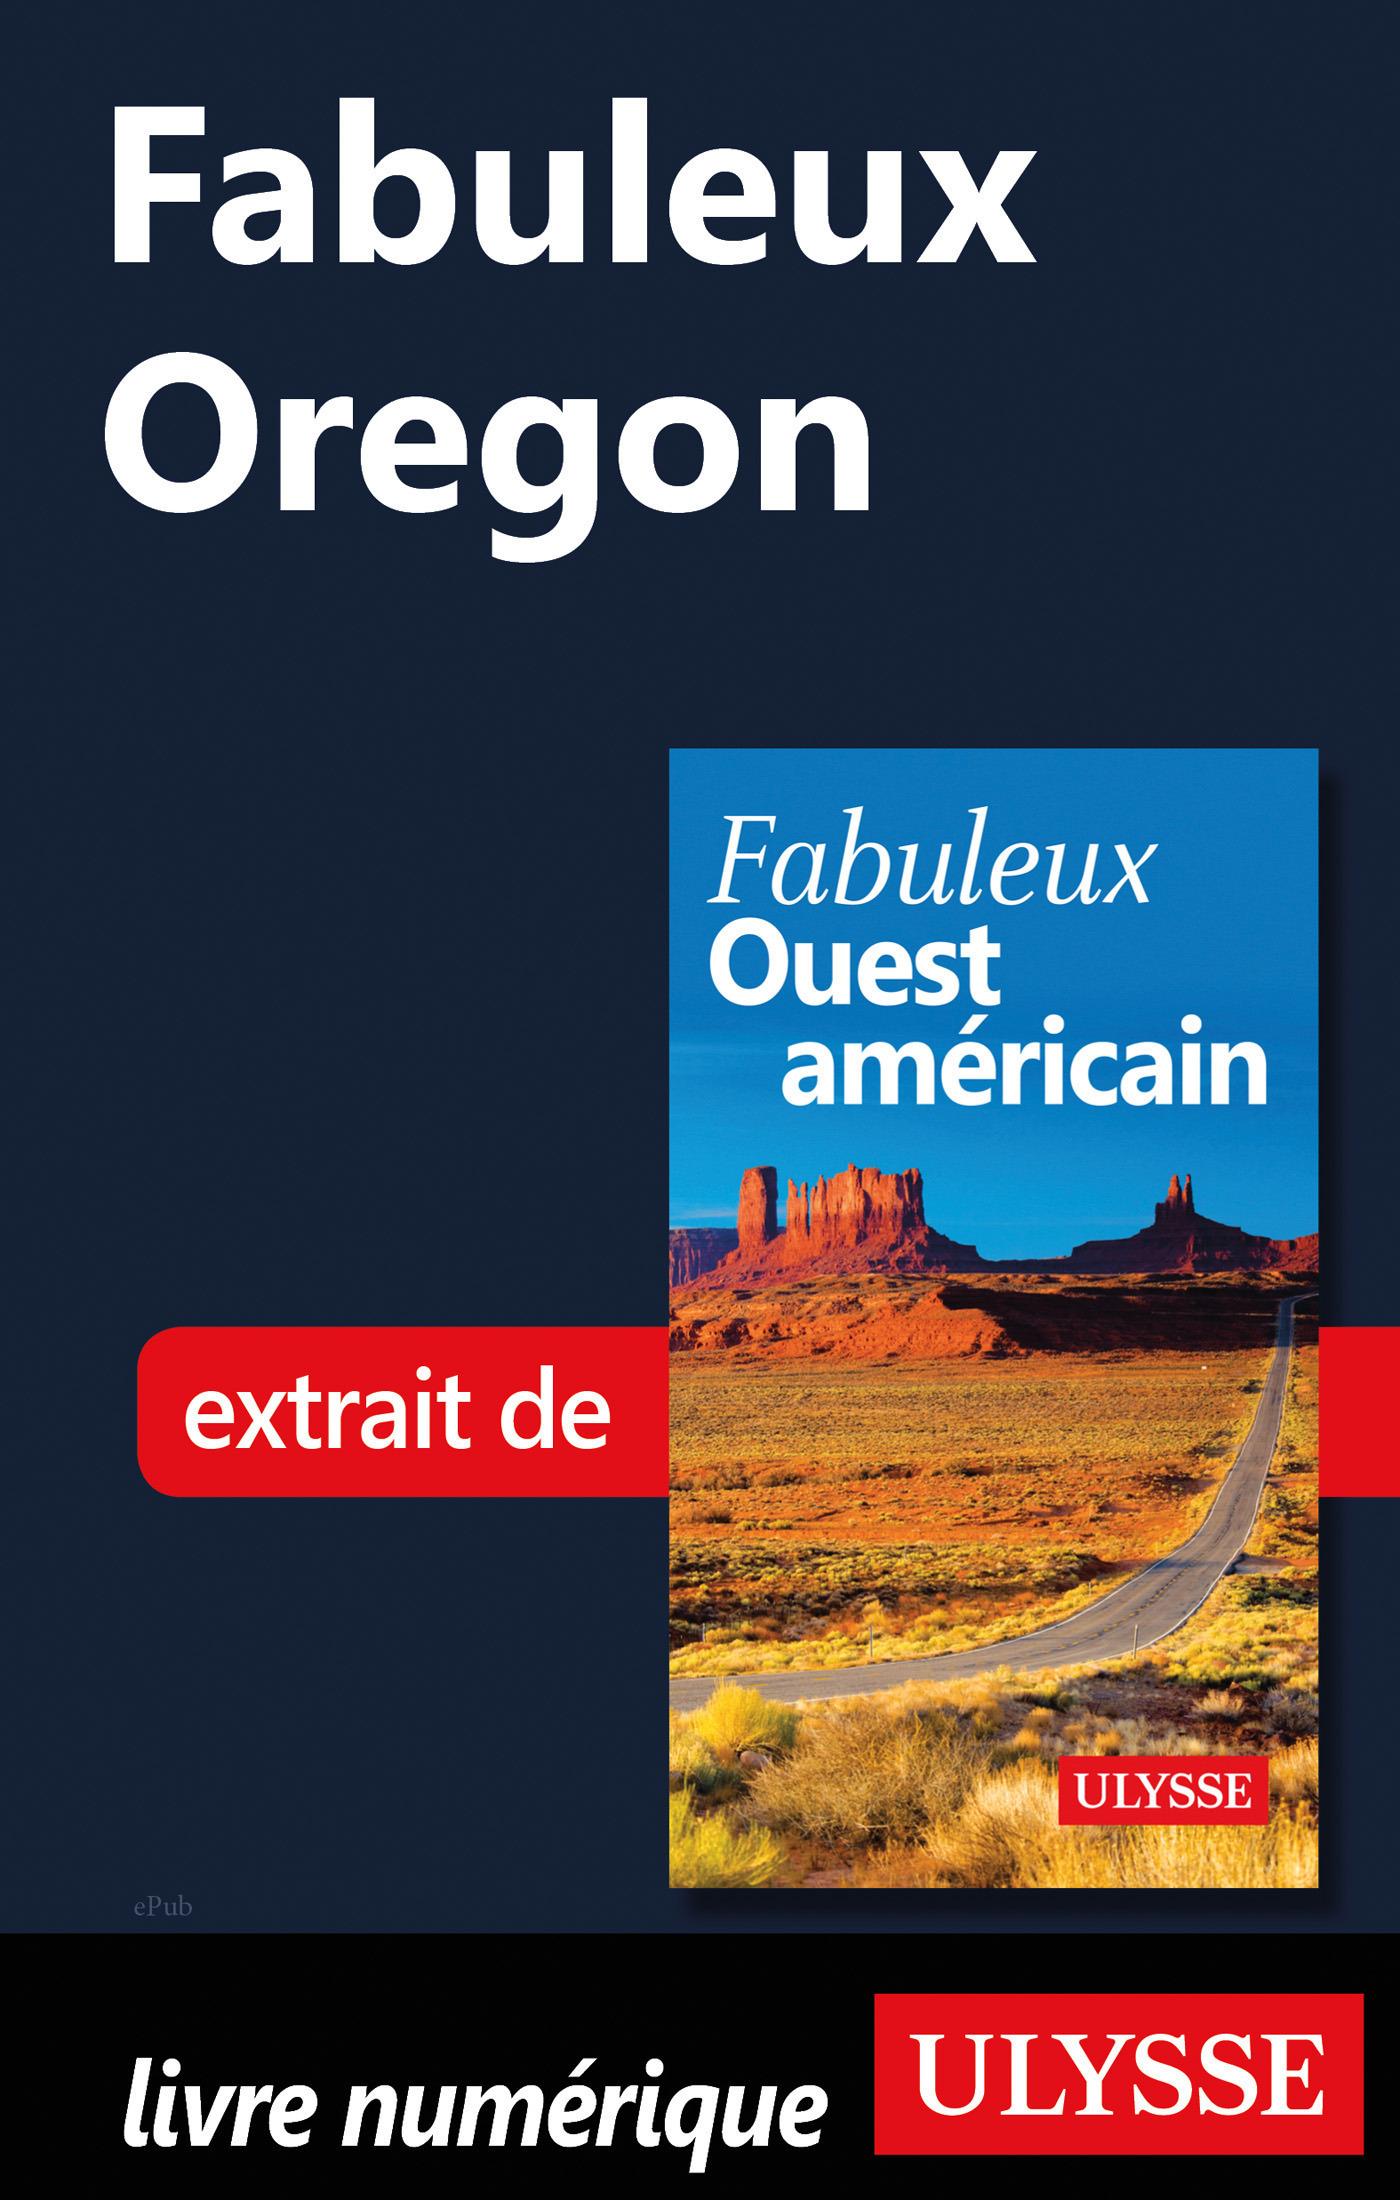 Fabuleux Oregon